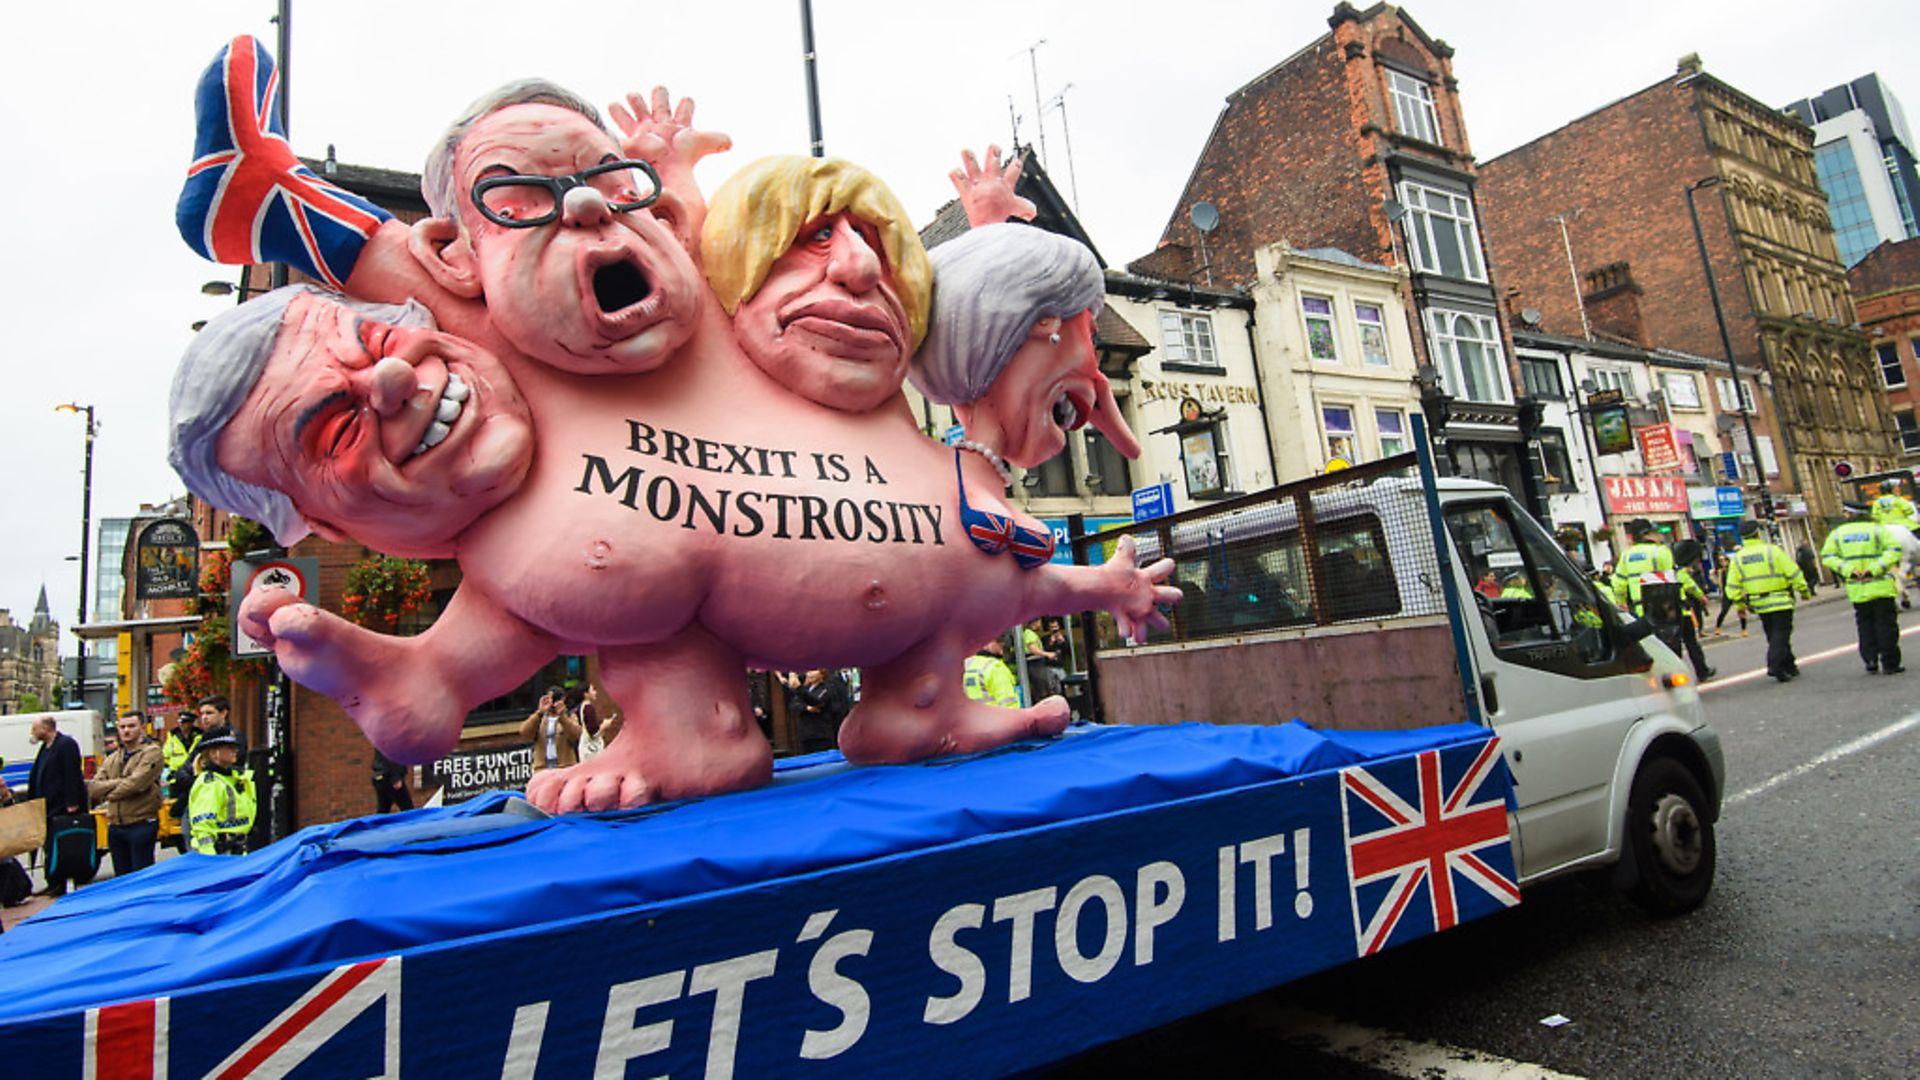 A float satirising Boris Johnson, Theresa May, David Davis and Liam Fox. photograph: Matt Crossick/EMPICS Entertainment. - Credit: Empics Entertainment